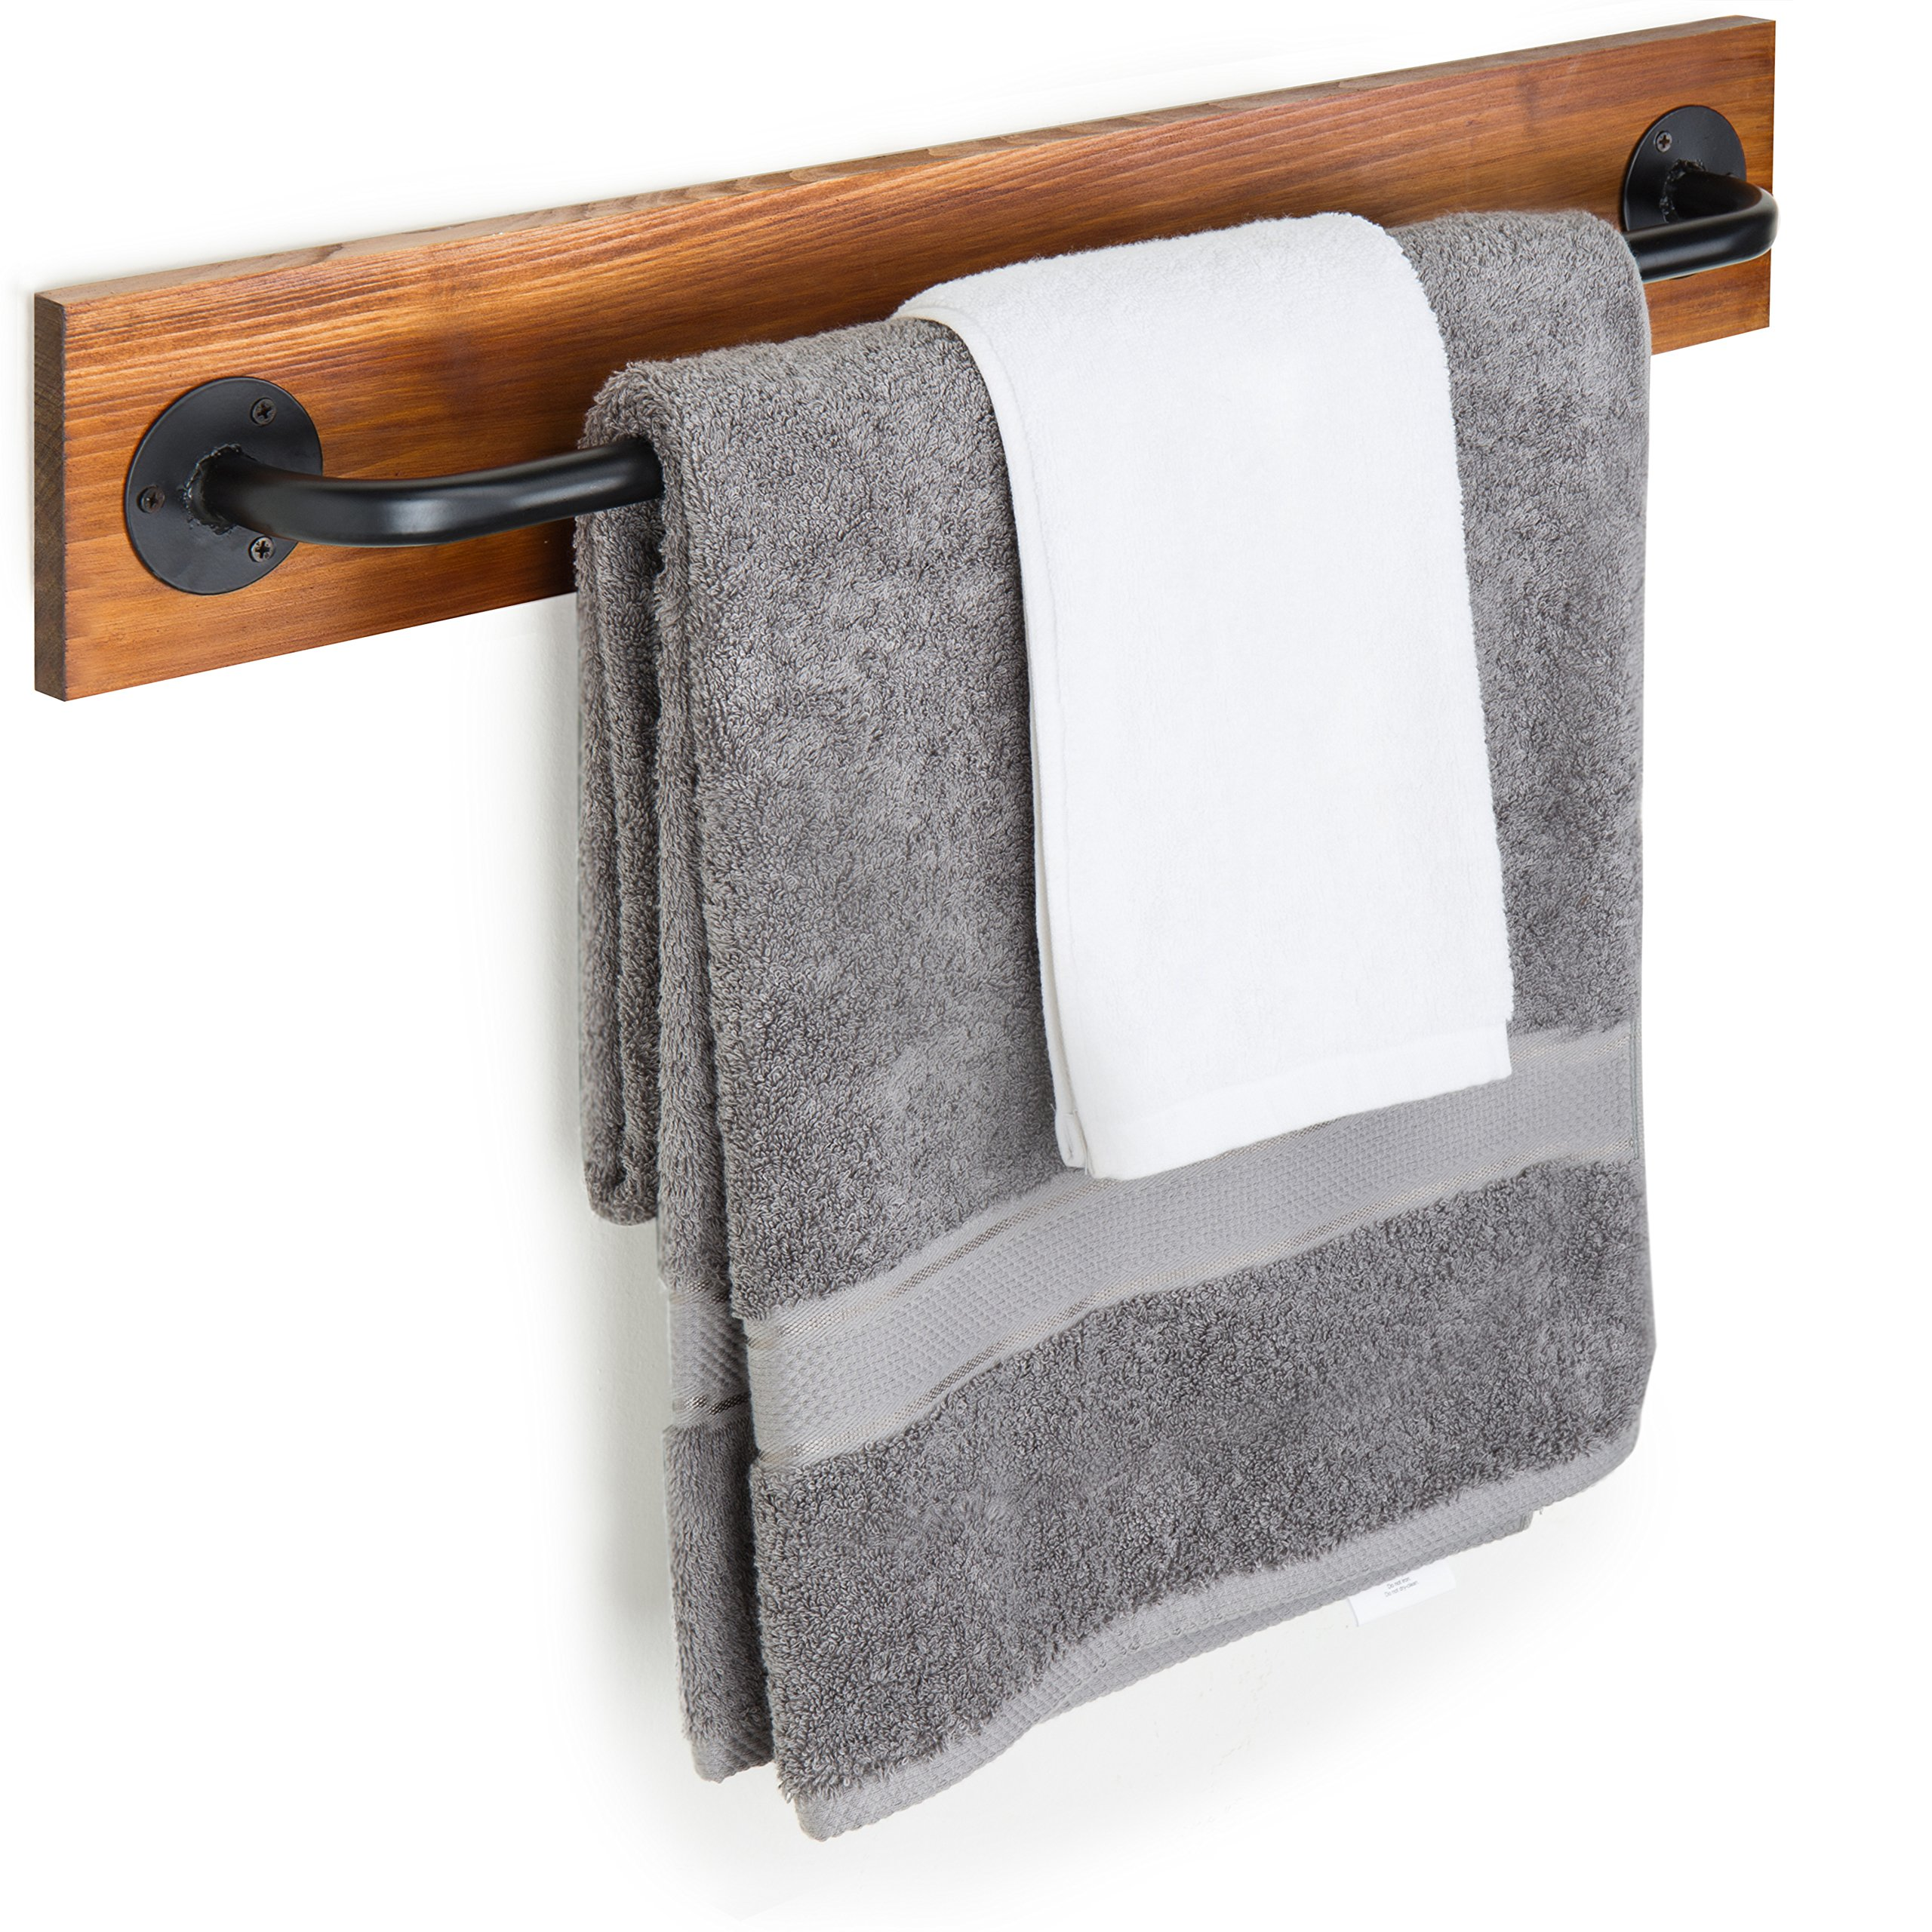 Rustic Wood & Metal Wall Mounted Towel Bar/Hanging Rod Unit For Modular Storage Racks